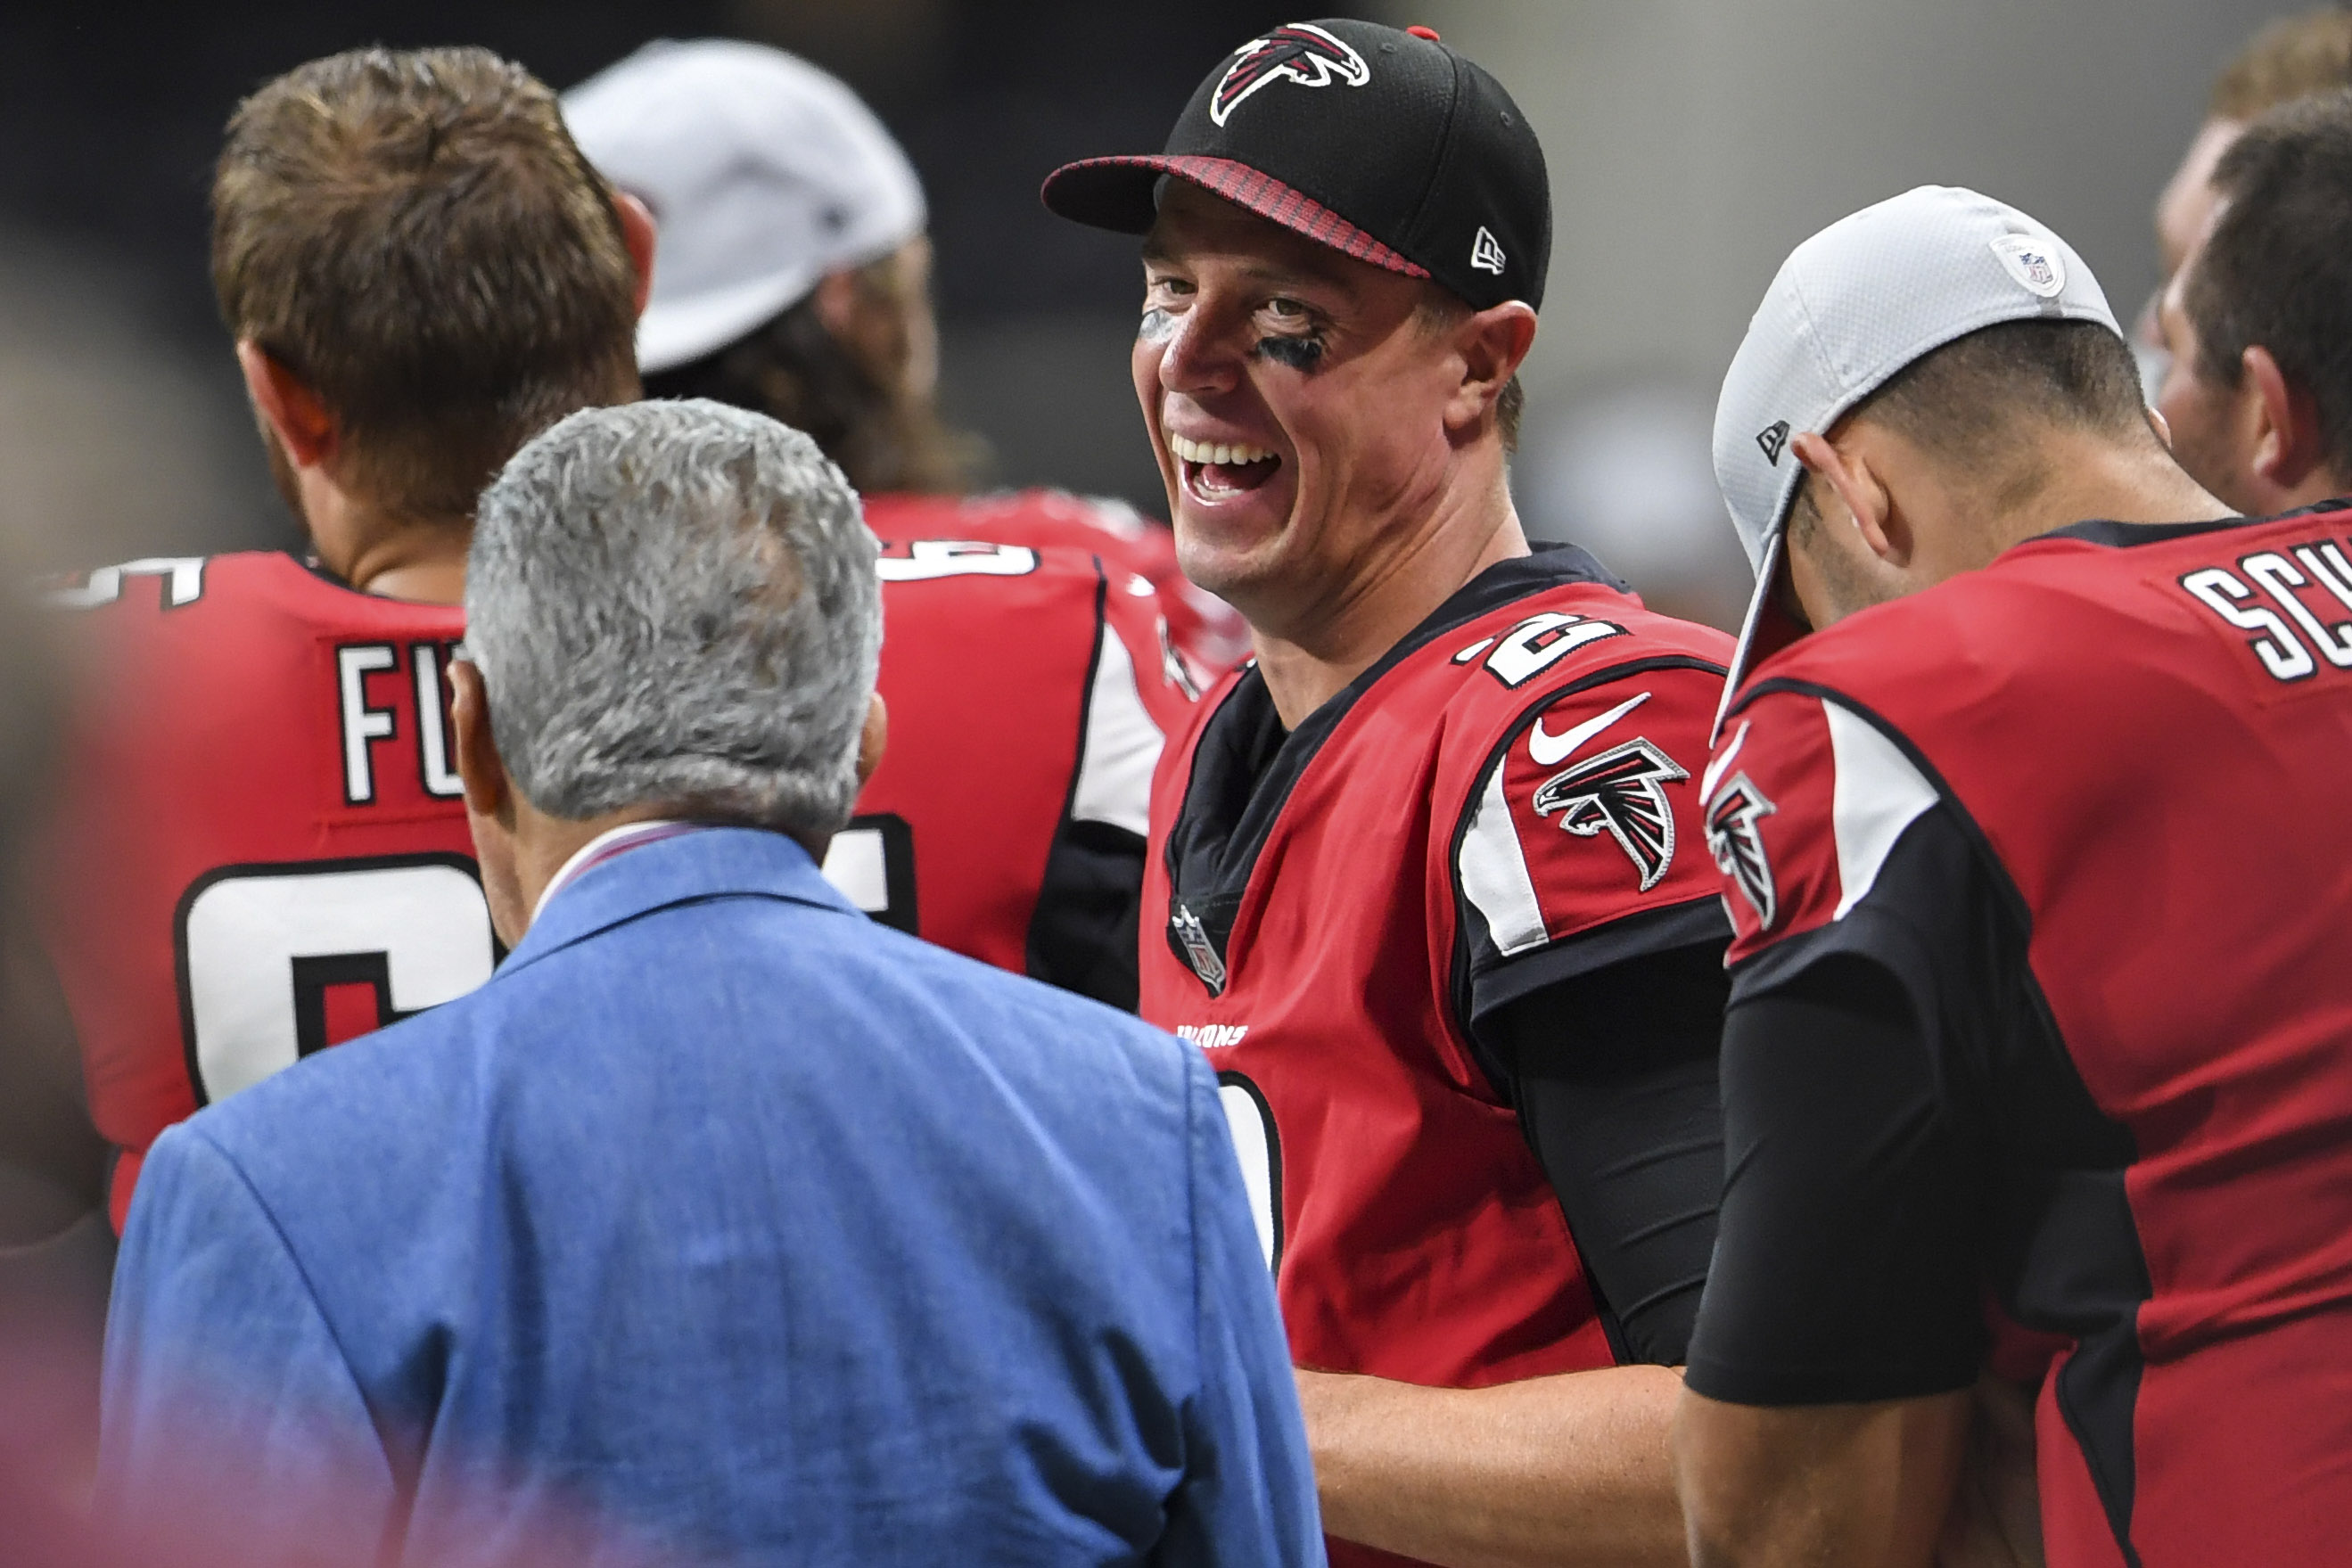 NFL: Kansas City Chiefs at Atlanta Falcons